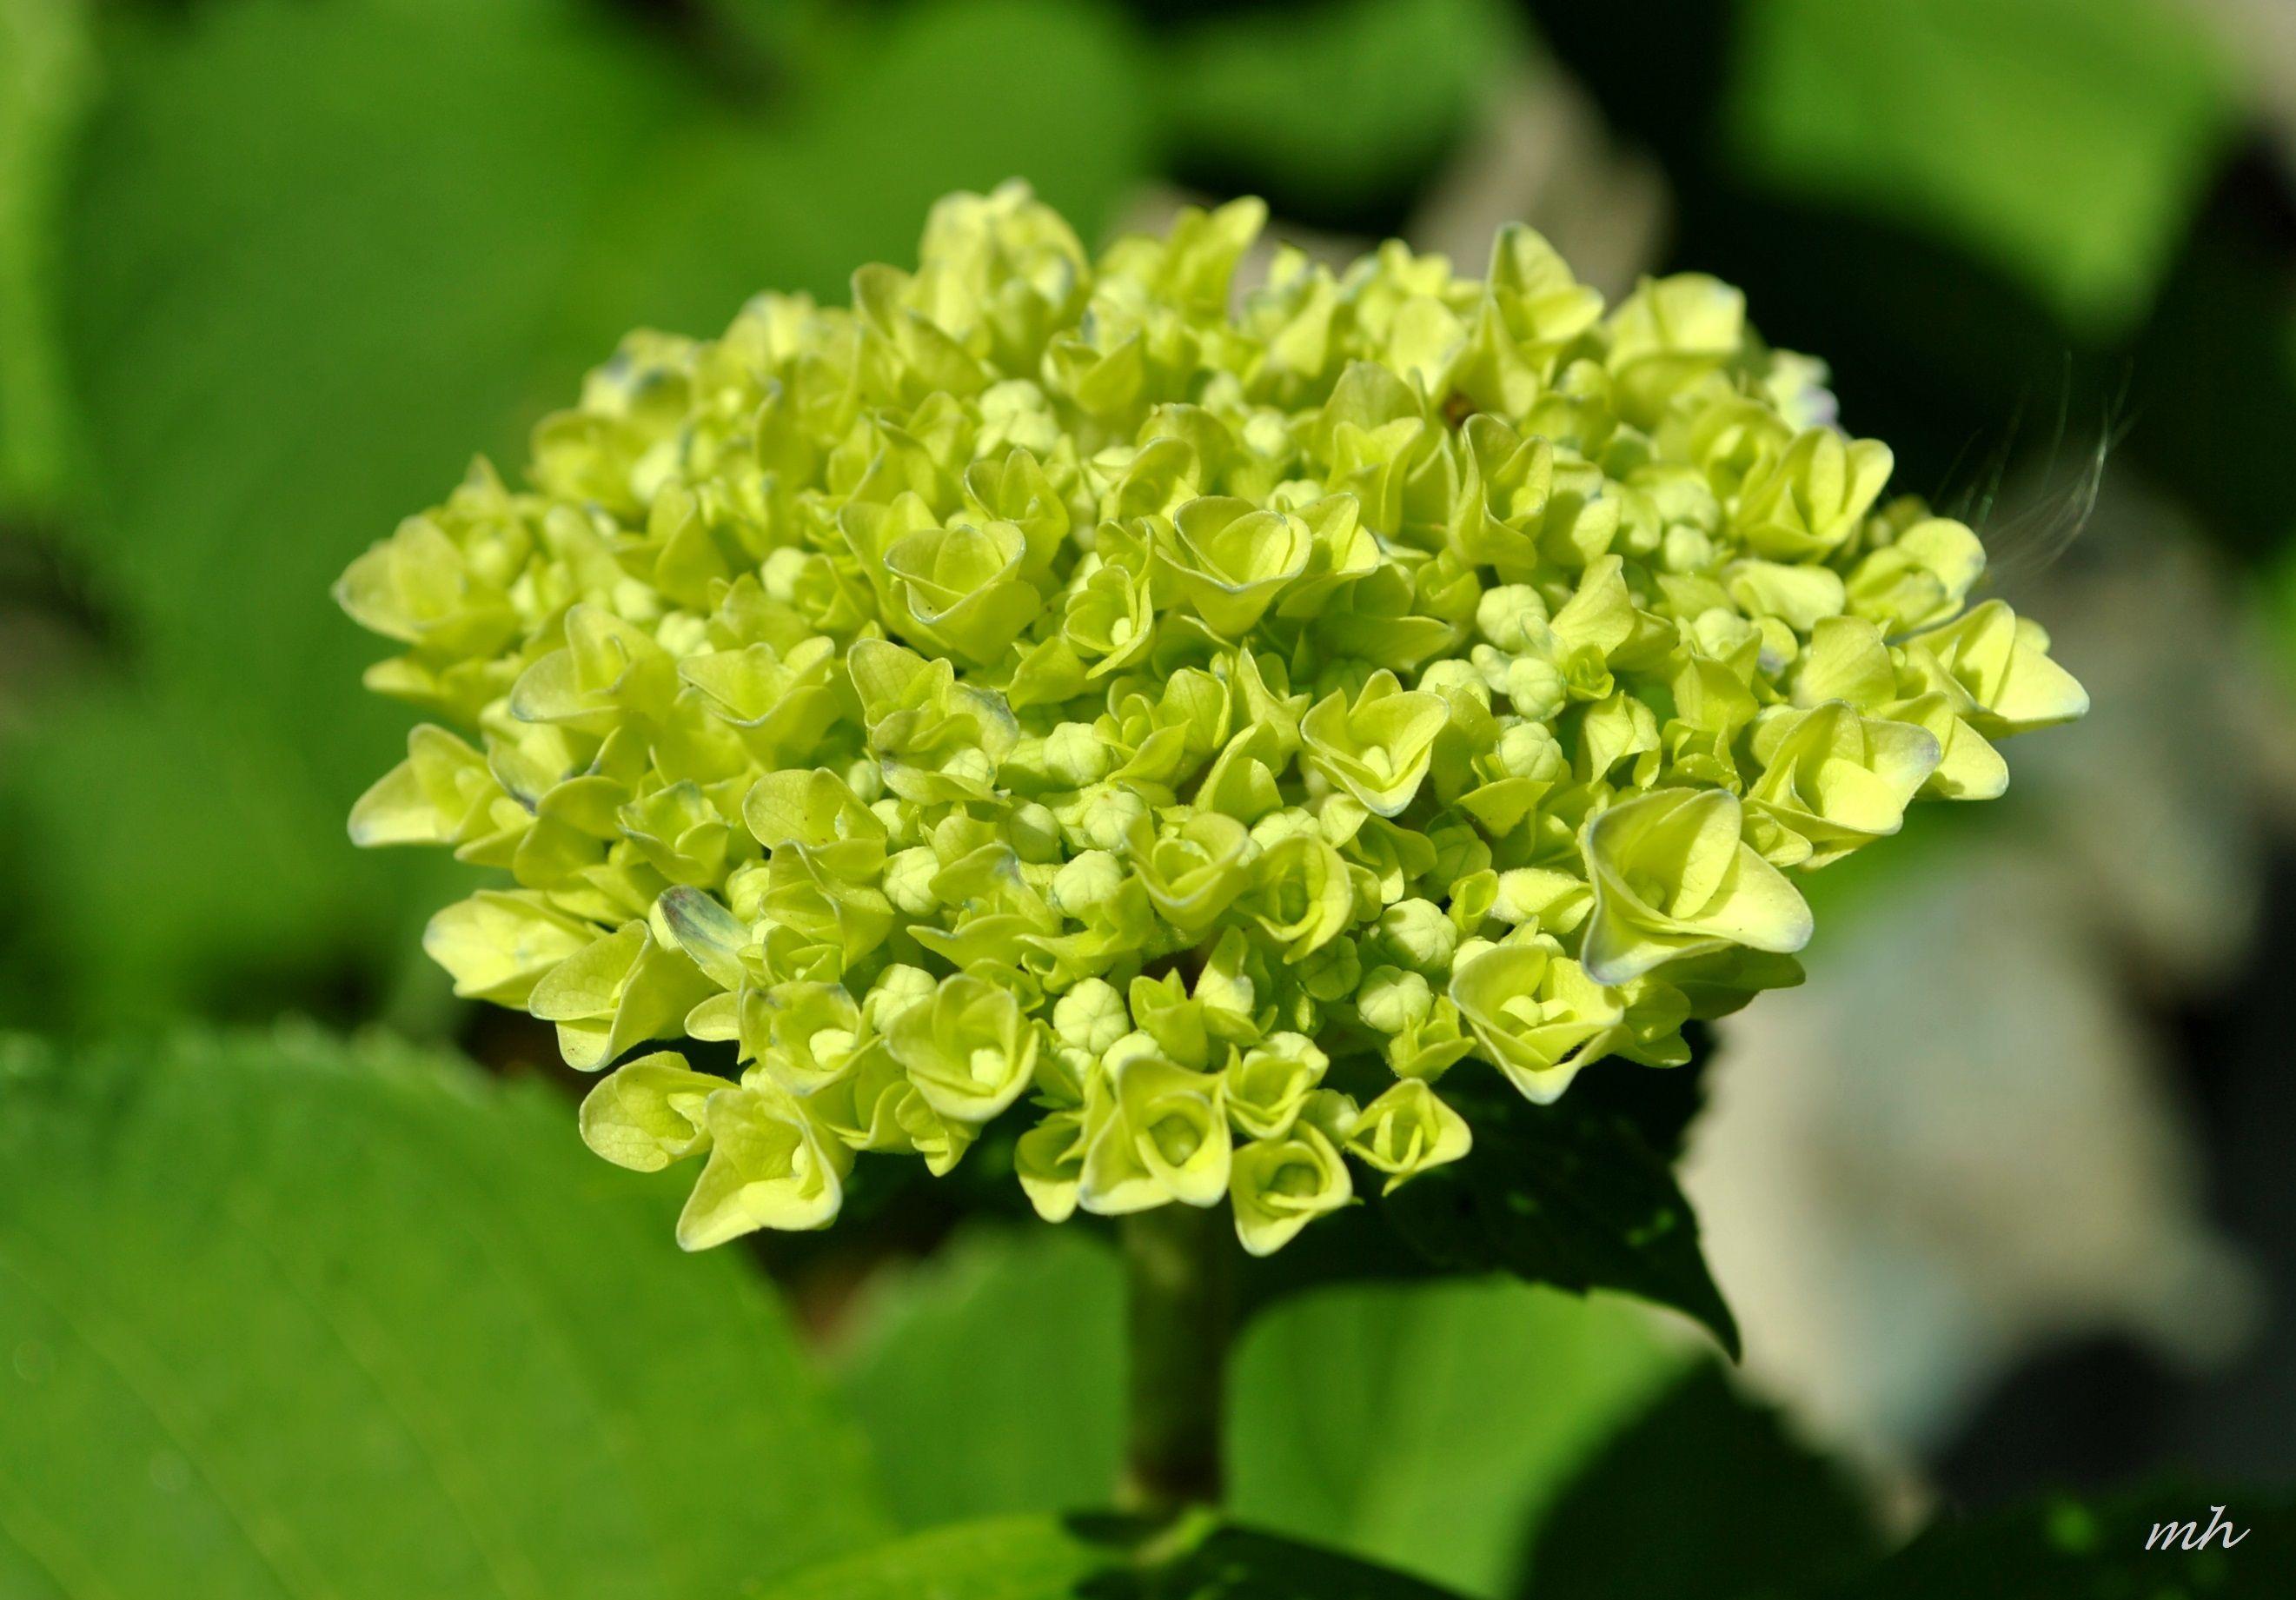 green chrysanthemum - Google Search